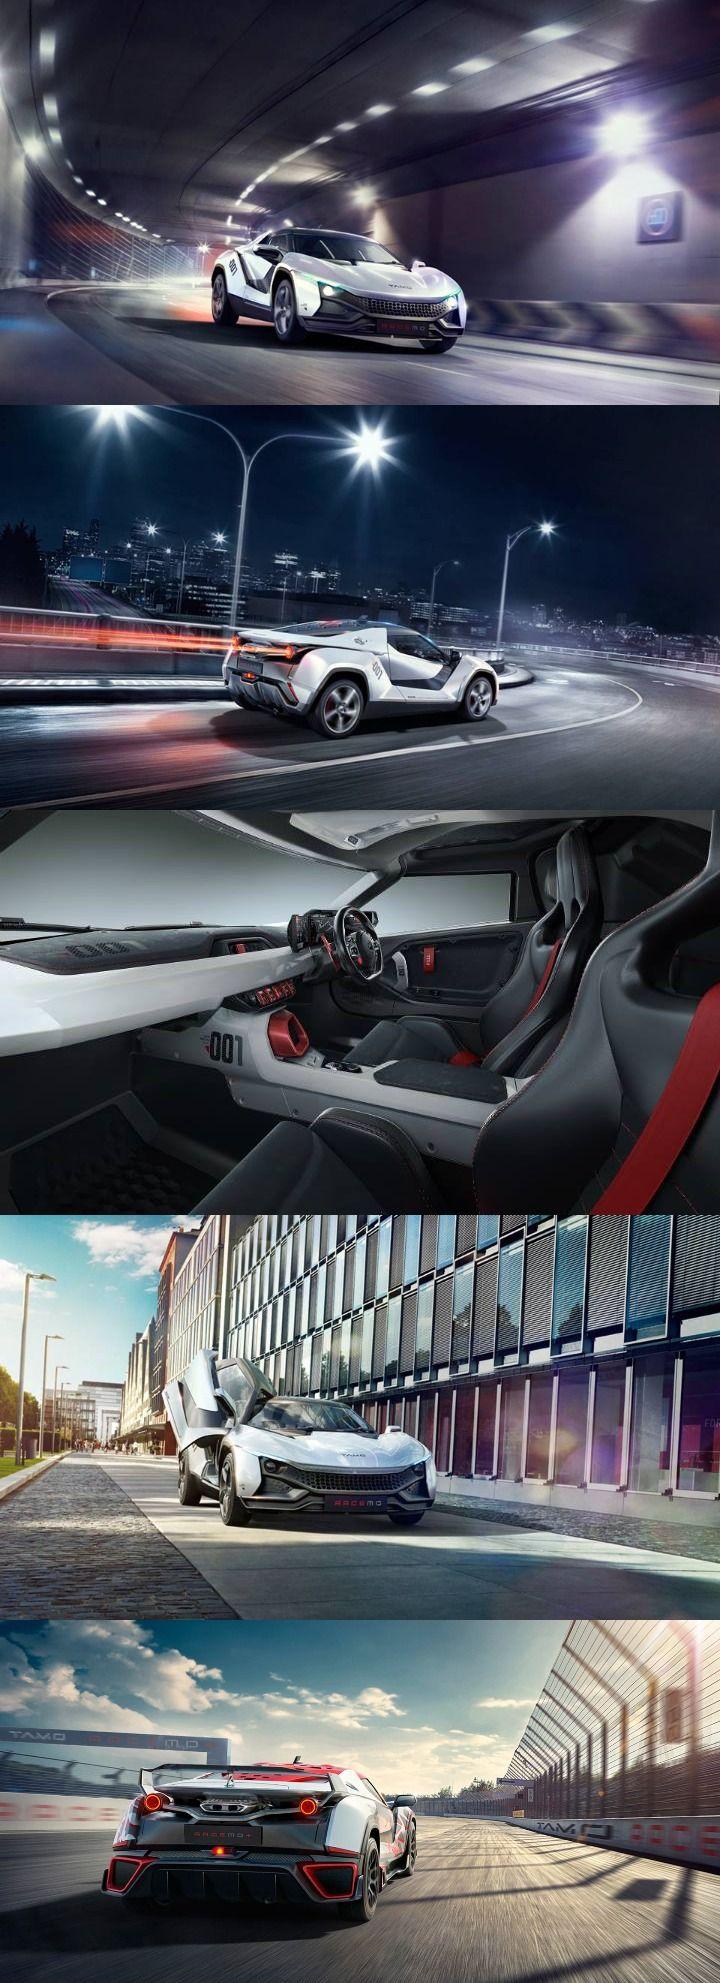 Tata Sports Car TaMo RaceMo Unwrapped at 2017 Geneva Motor Show